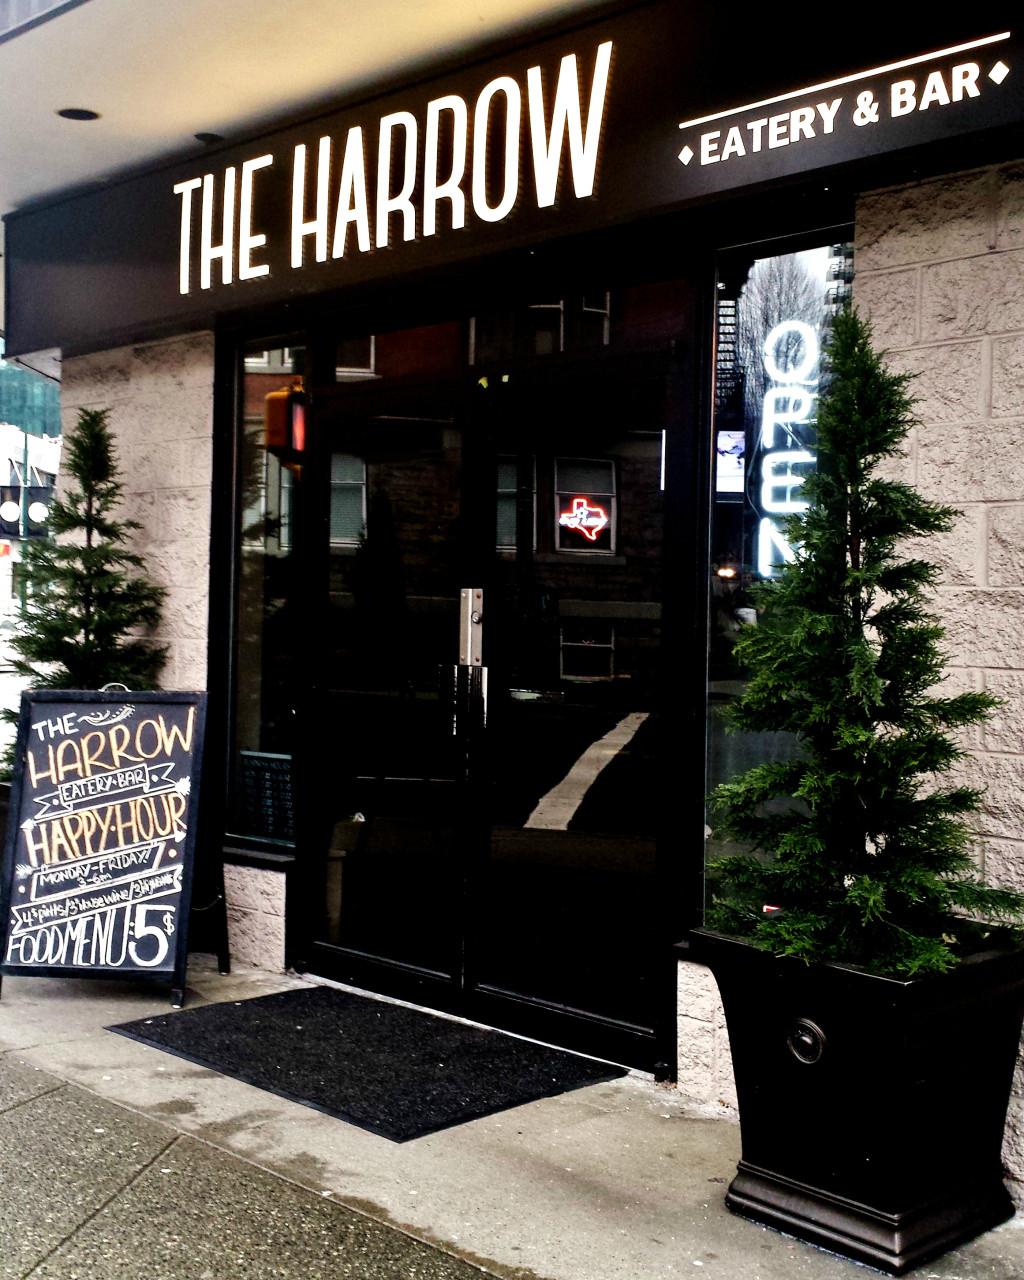 The Harrow Eatery & Pub